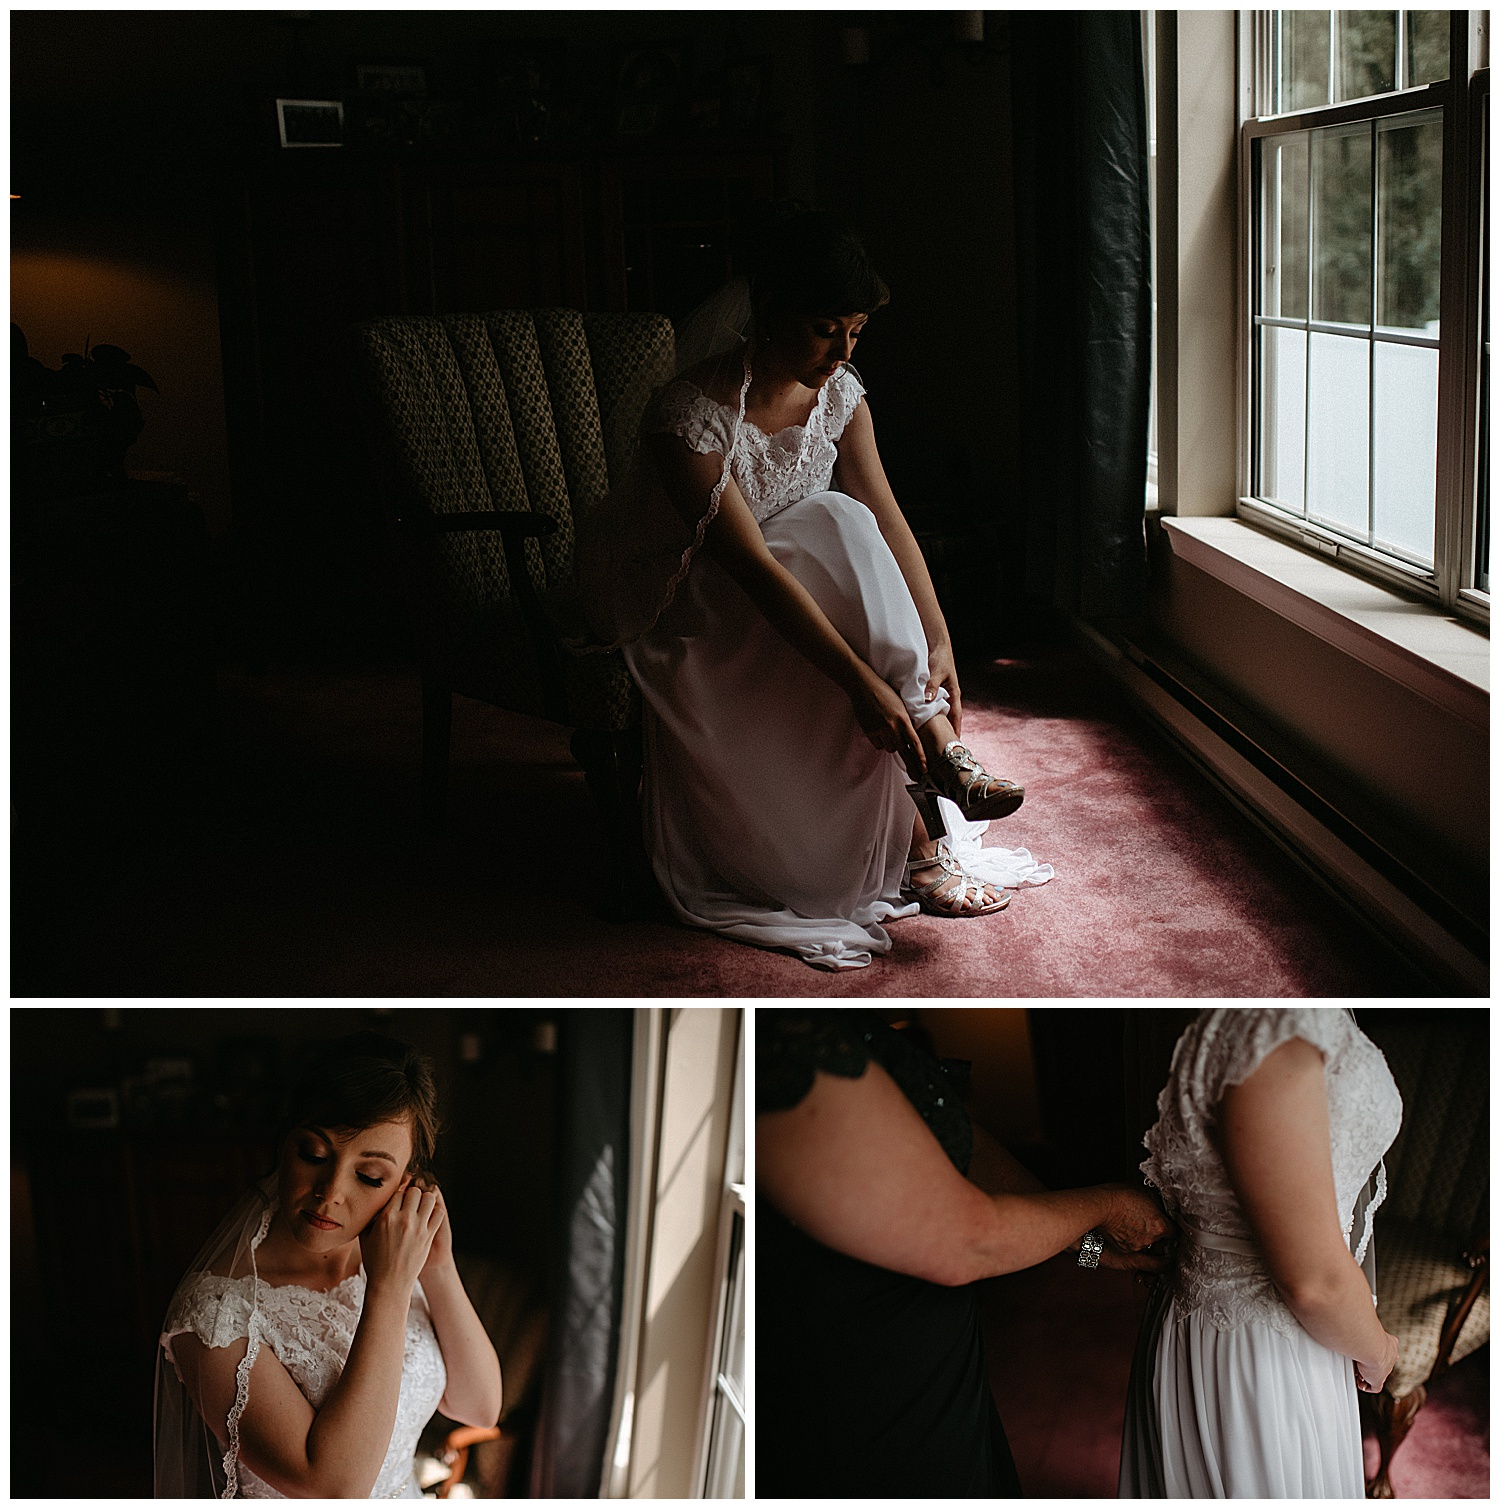 NEPA-Mount-Pocono-Wedding-Photographer-at-the-Stroudsmoor-Country-Inn-Stroudsburg-PA_0019.jpg